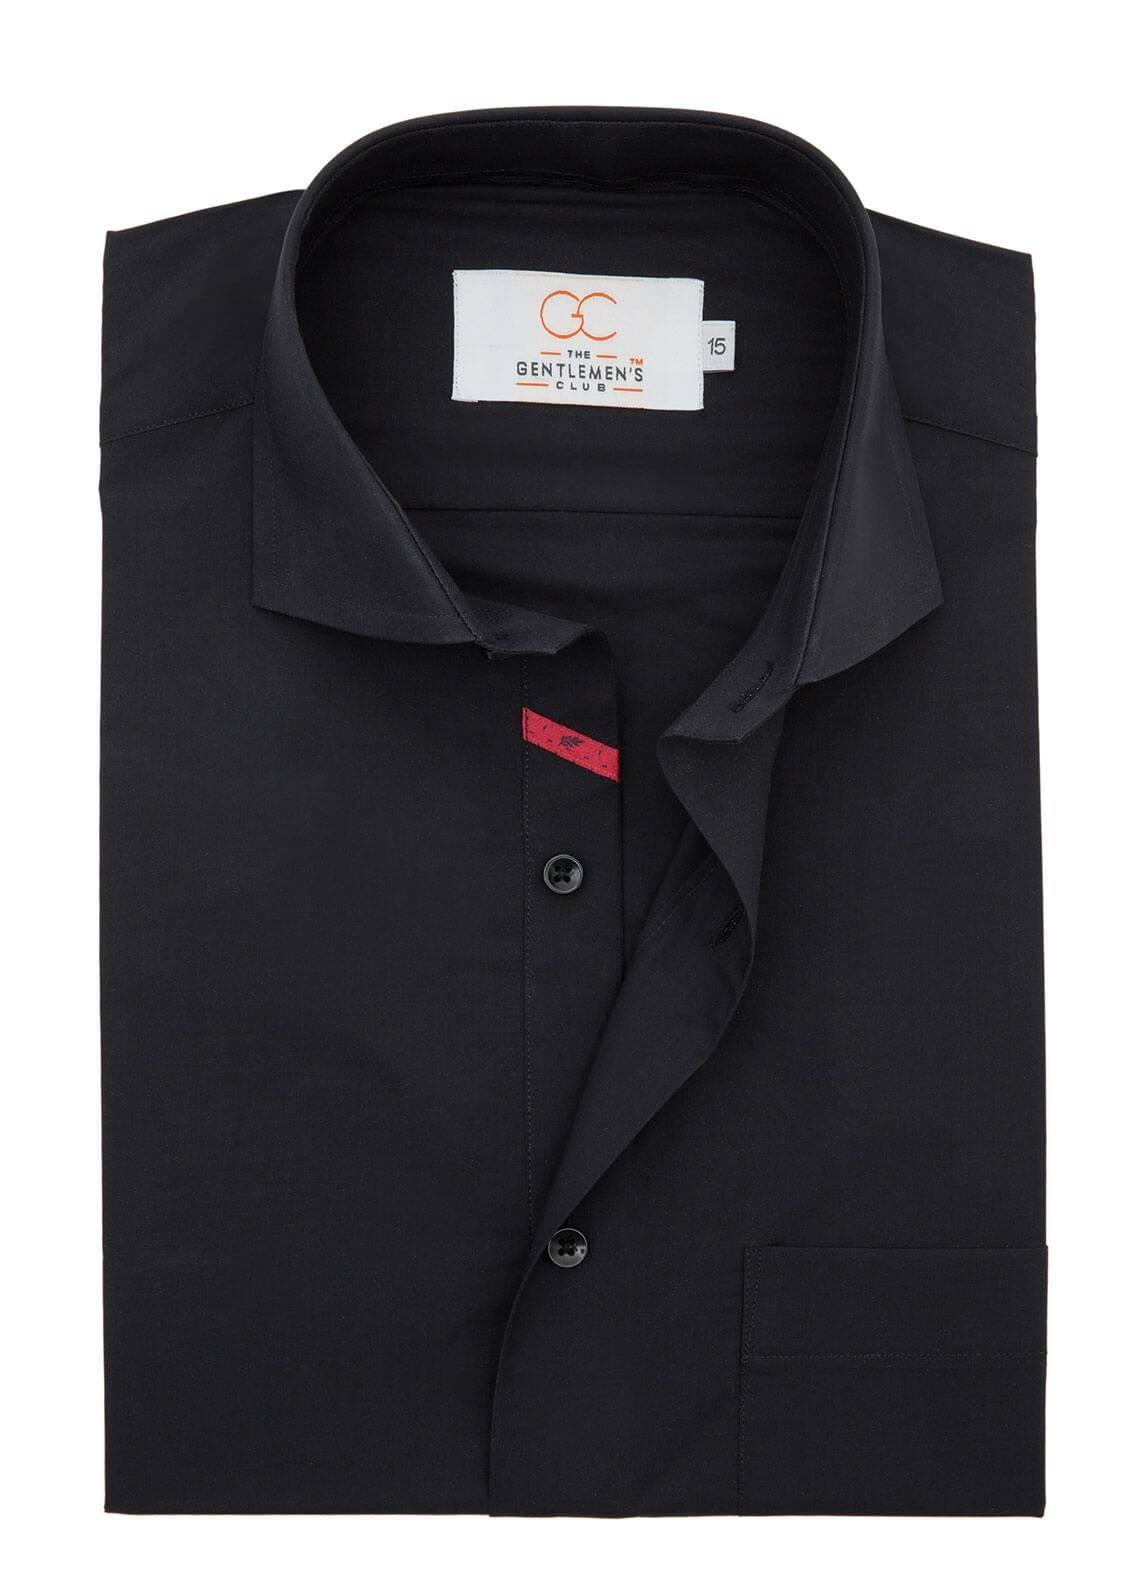 The Gentlemen's Club Cotton Formal Shirts for Men - Black White Label 4070 - 18.5